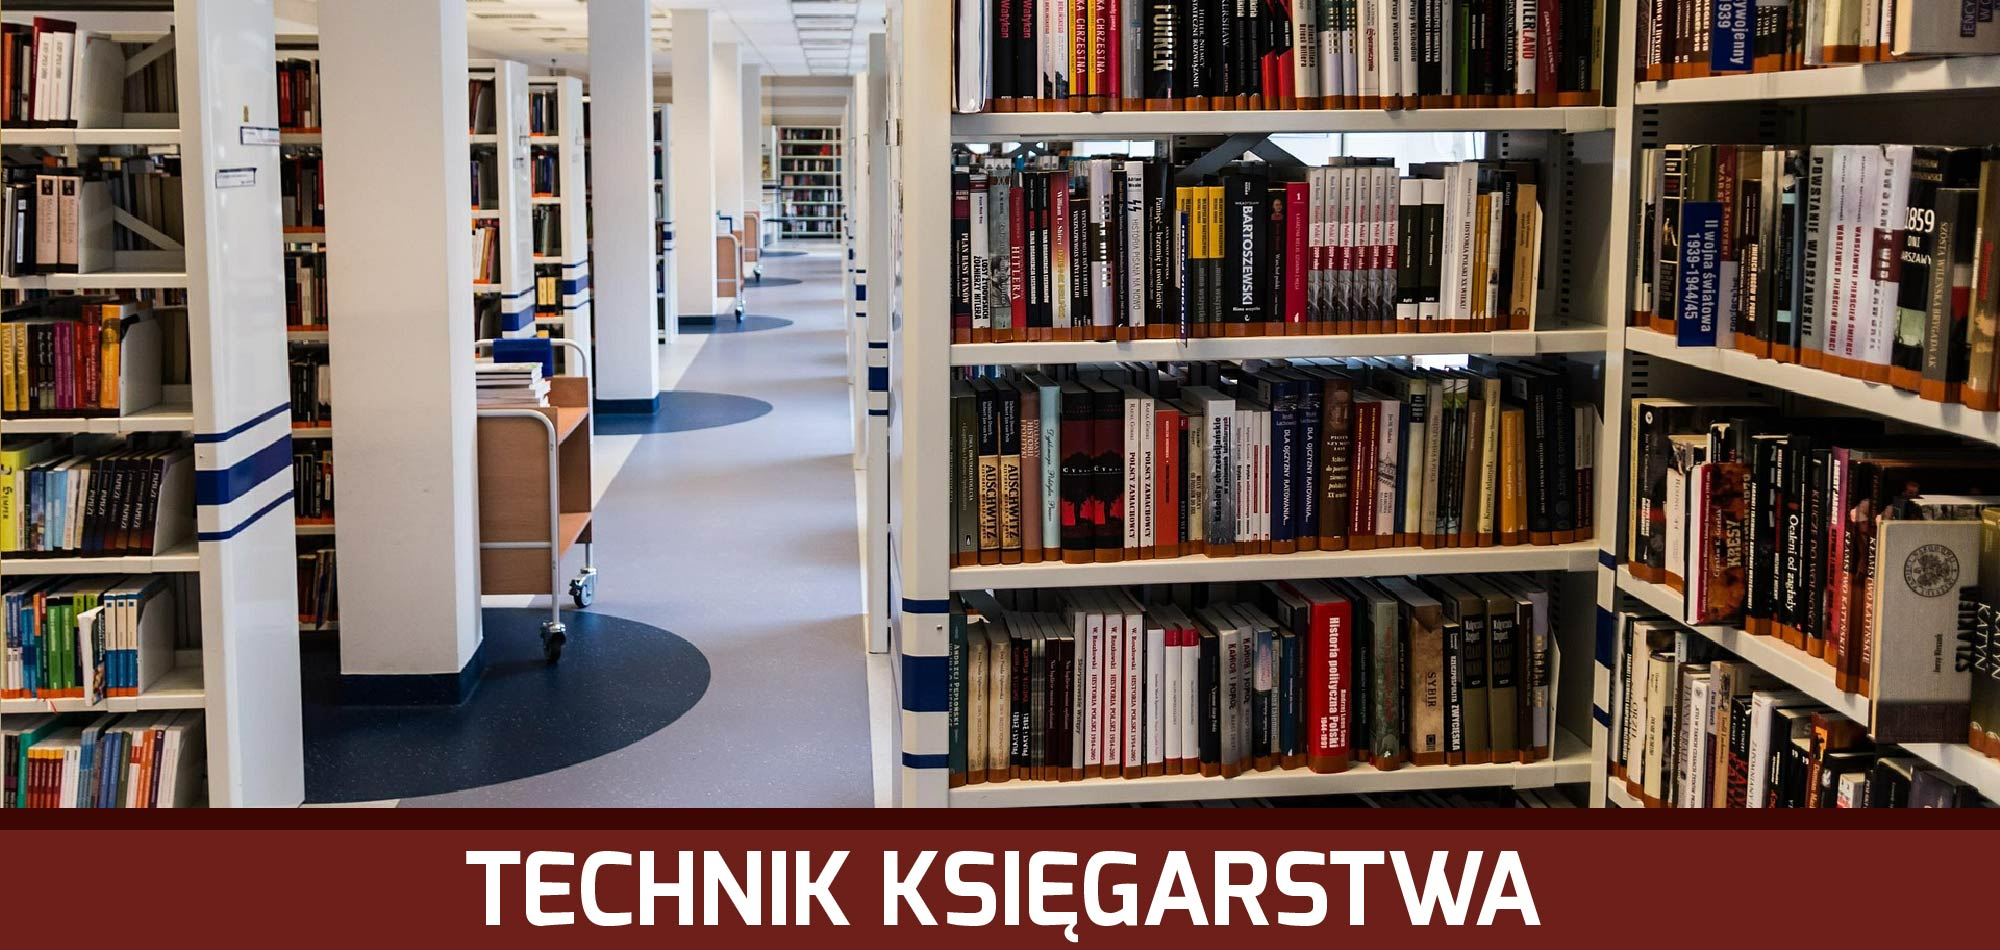 Technik księgarstwa | Technikum Nr1 wZamościu